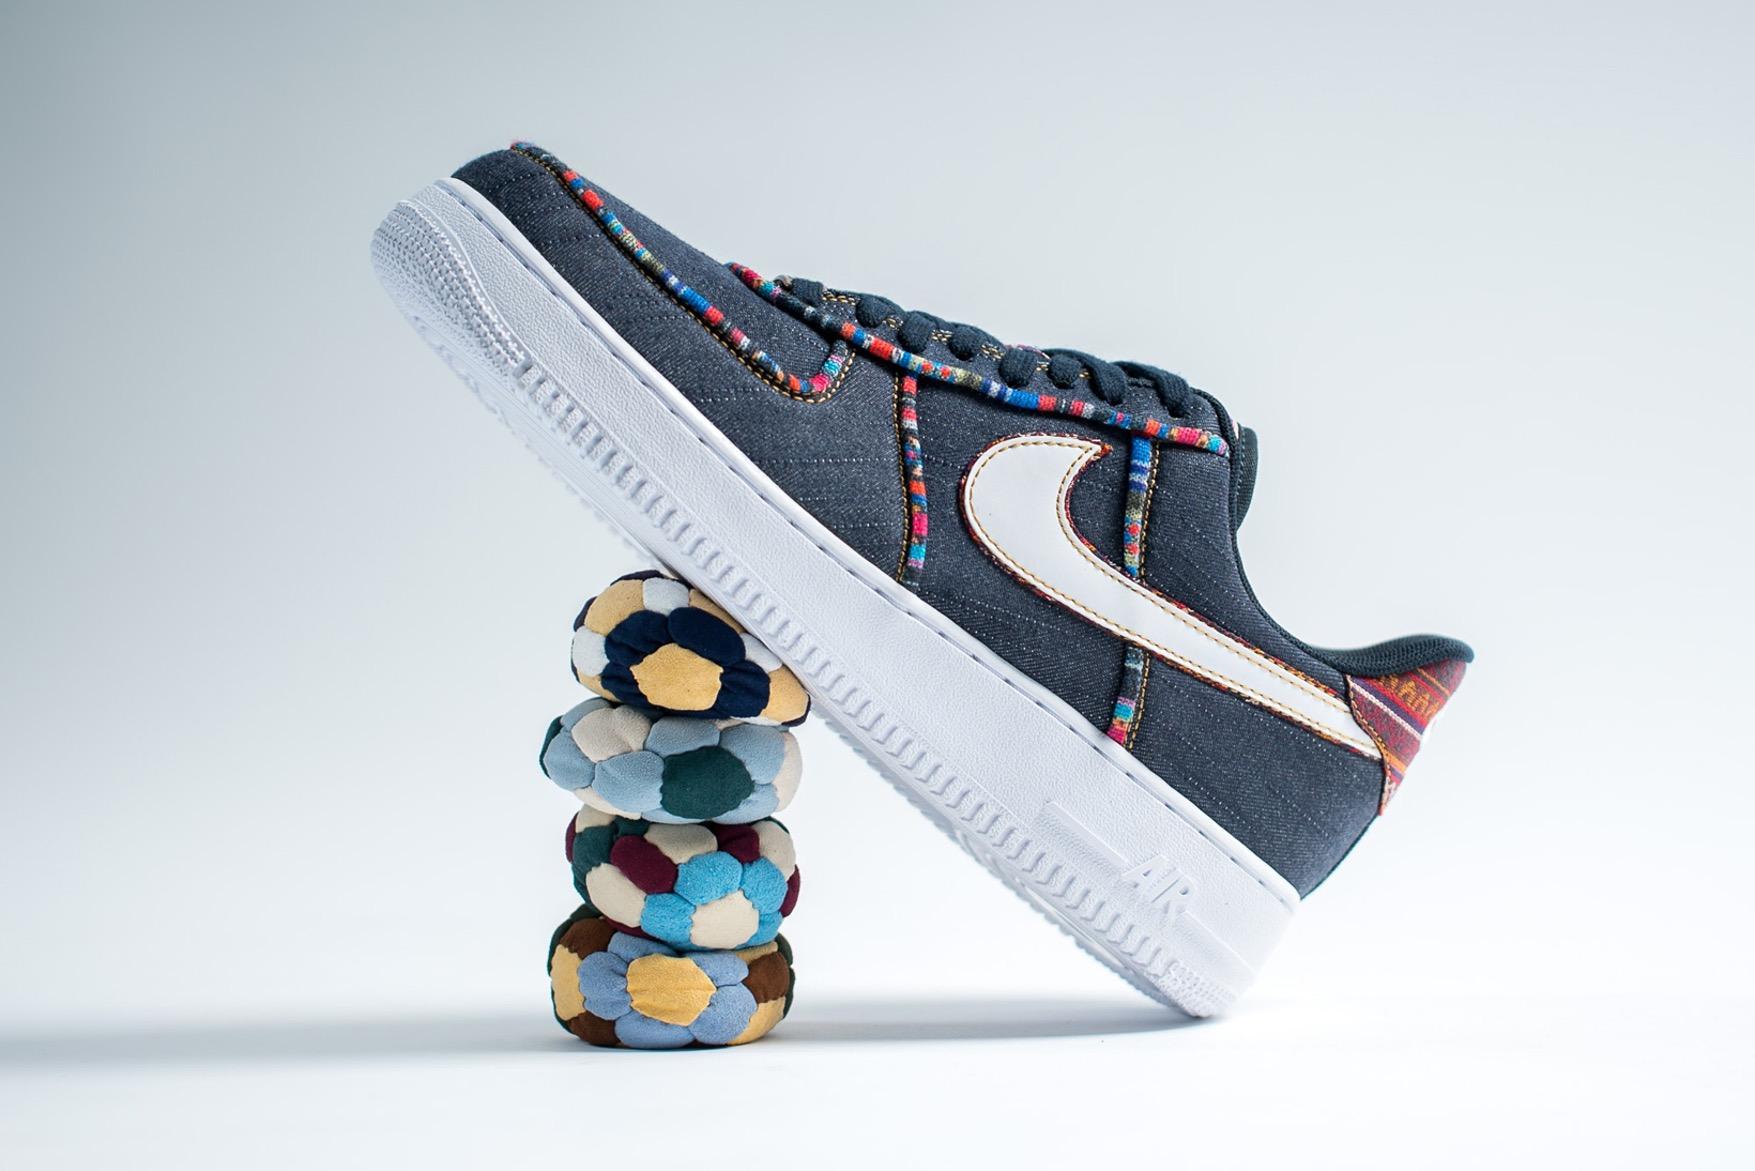 Force 1 Drops Air Nike Low IvYfy6b7gm